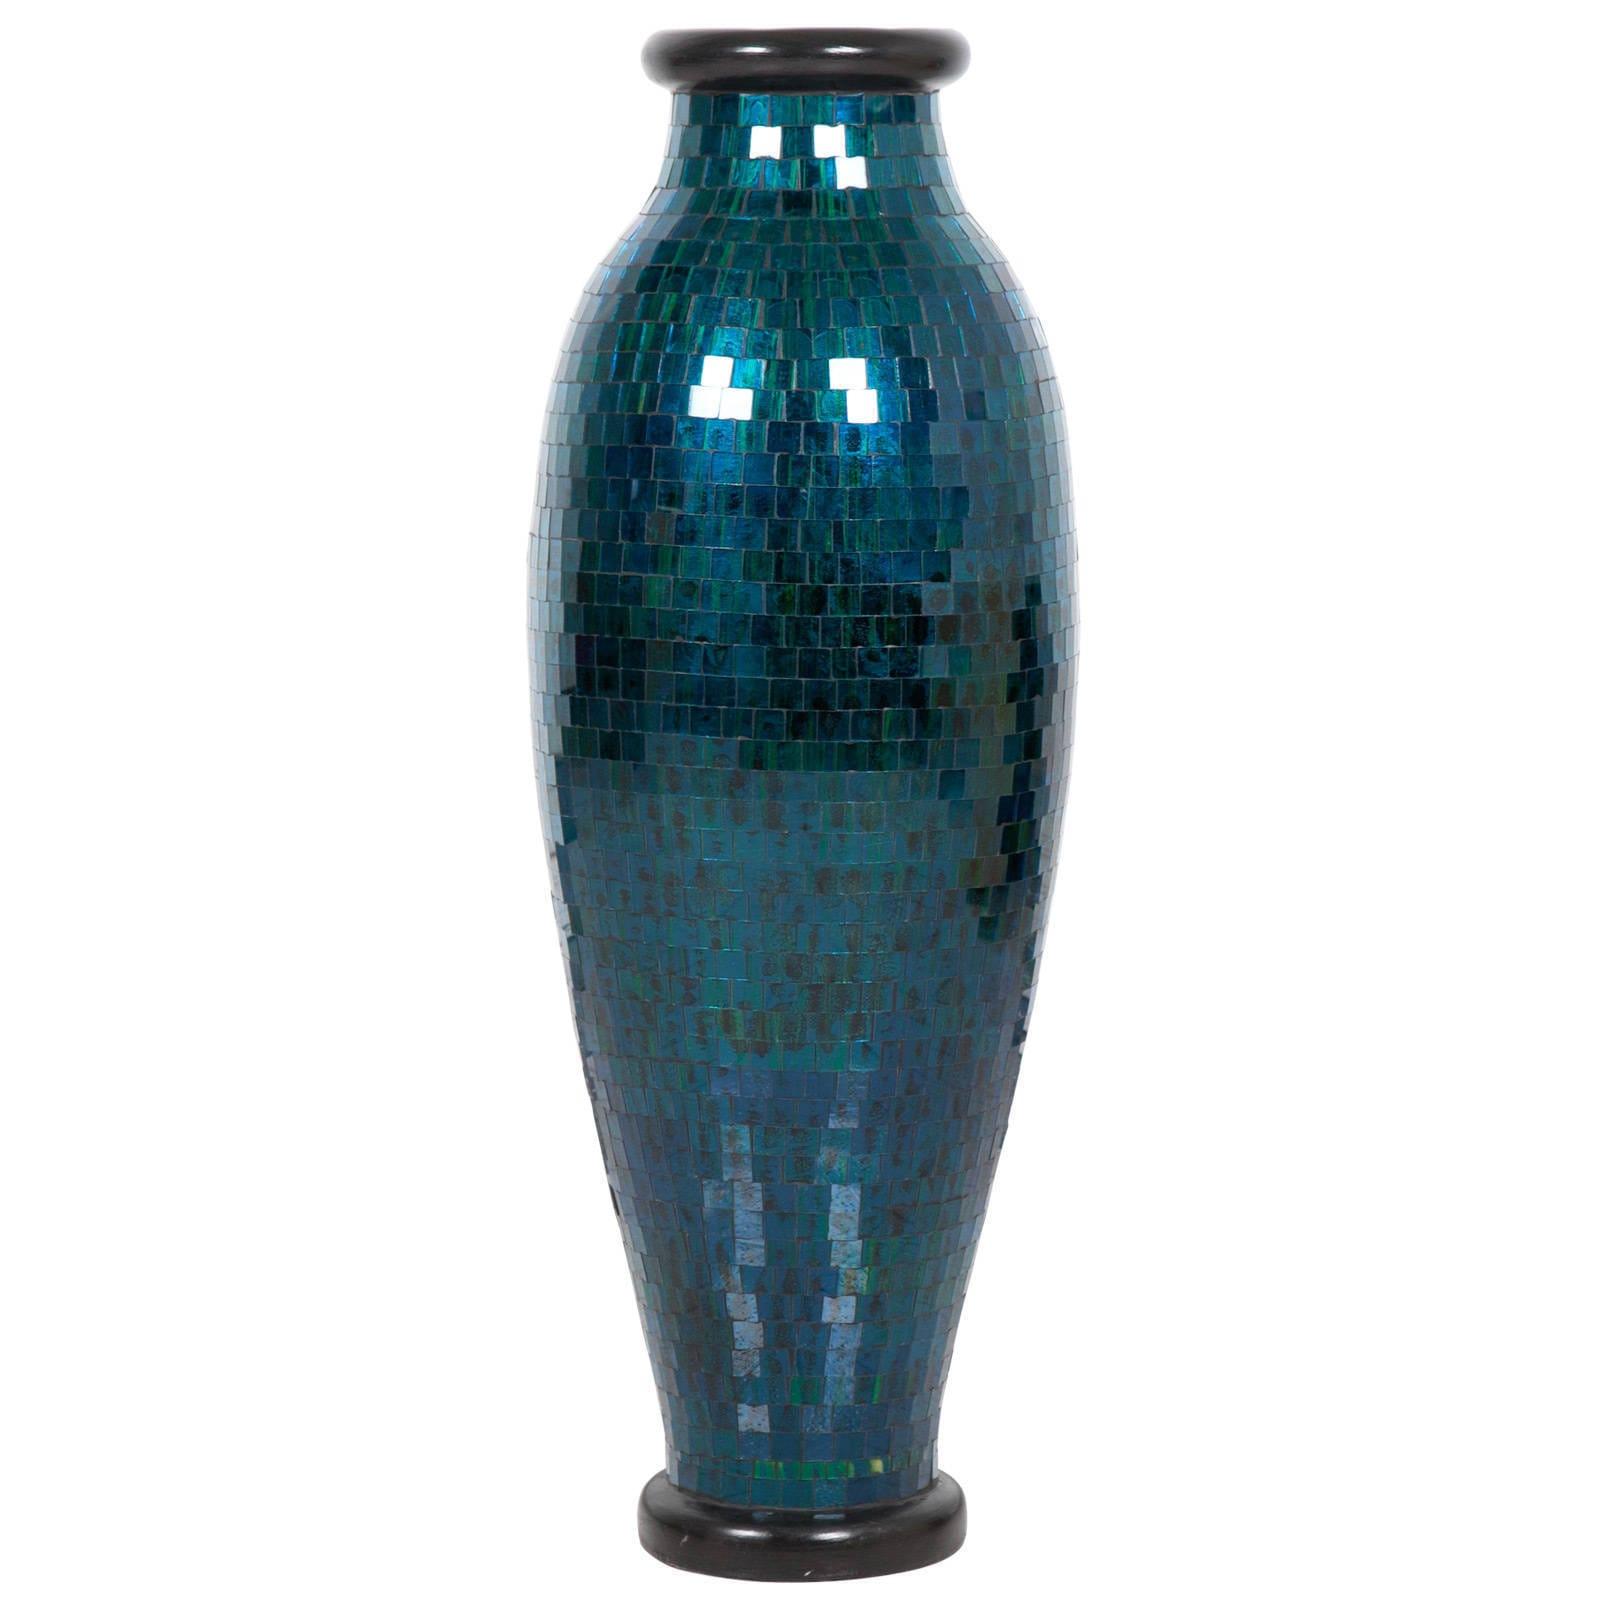 Turquoise Mosaic Floor Vase